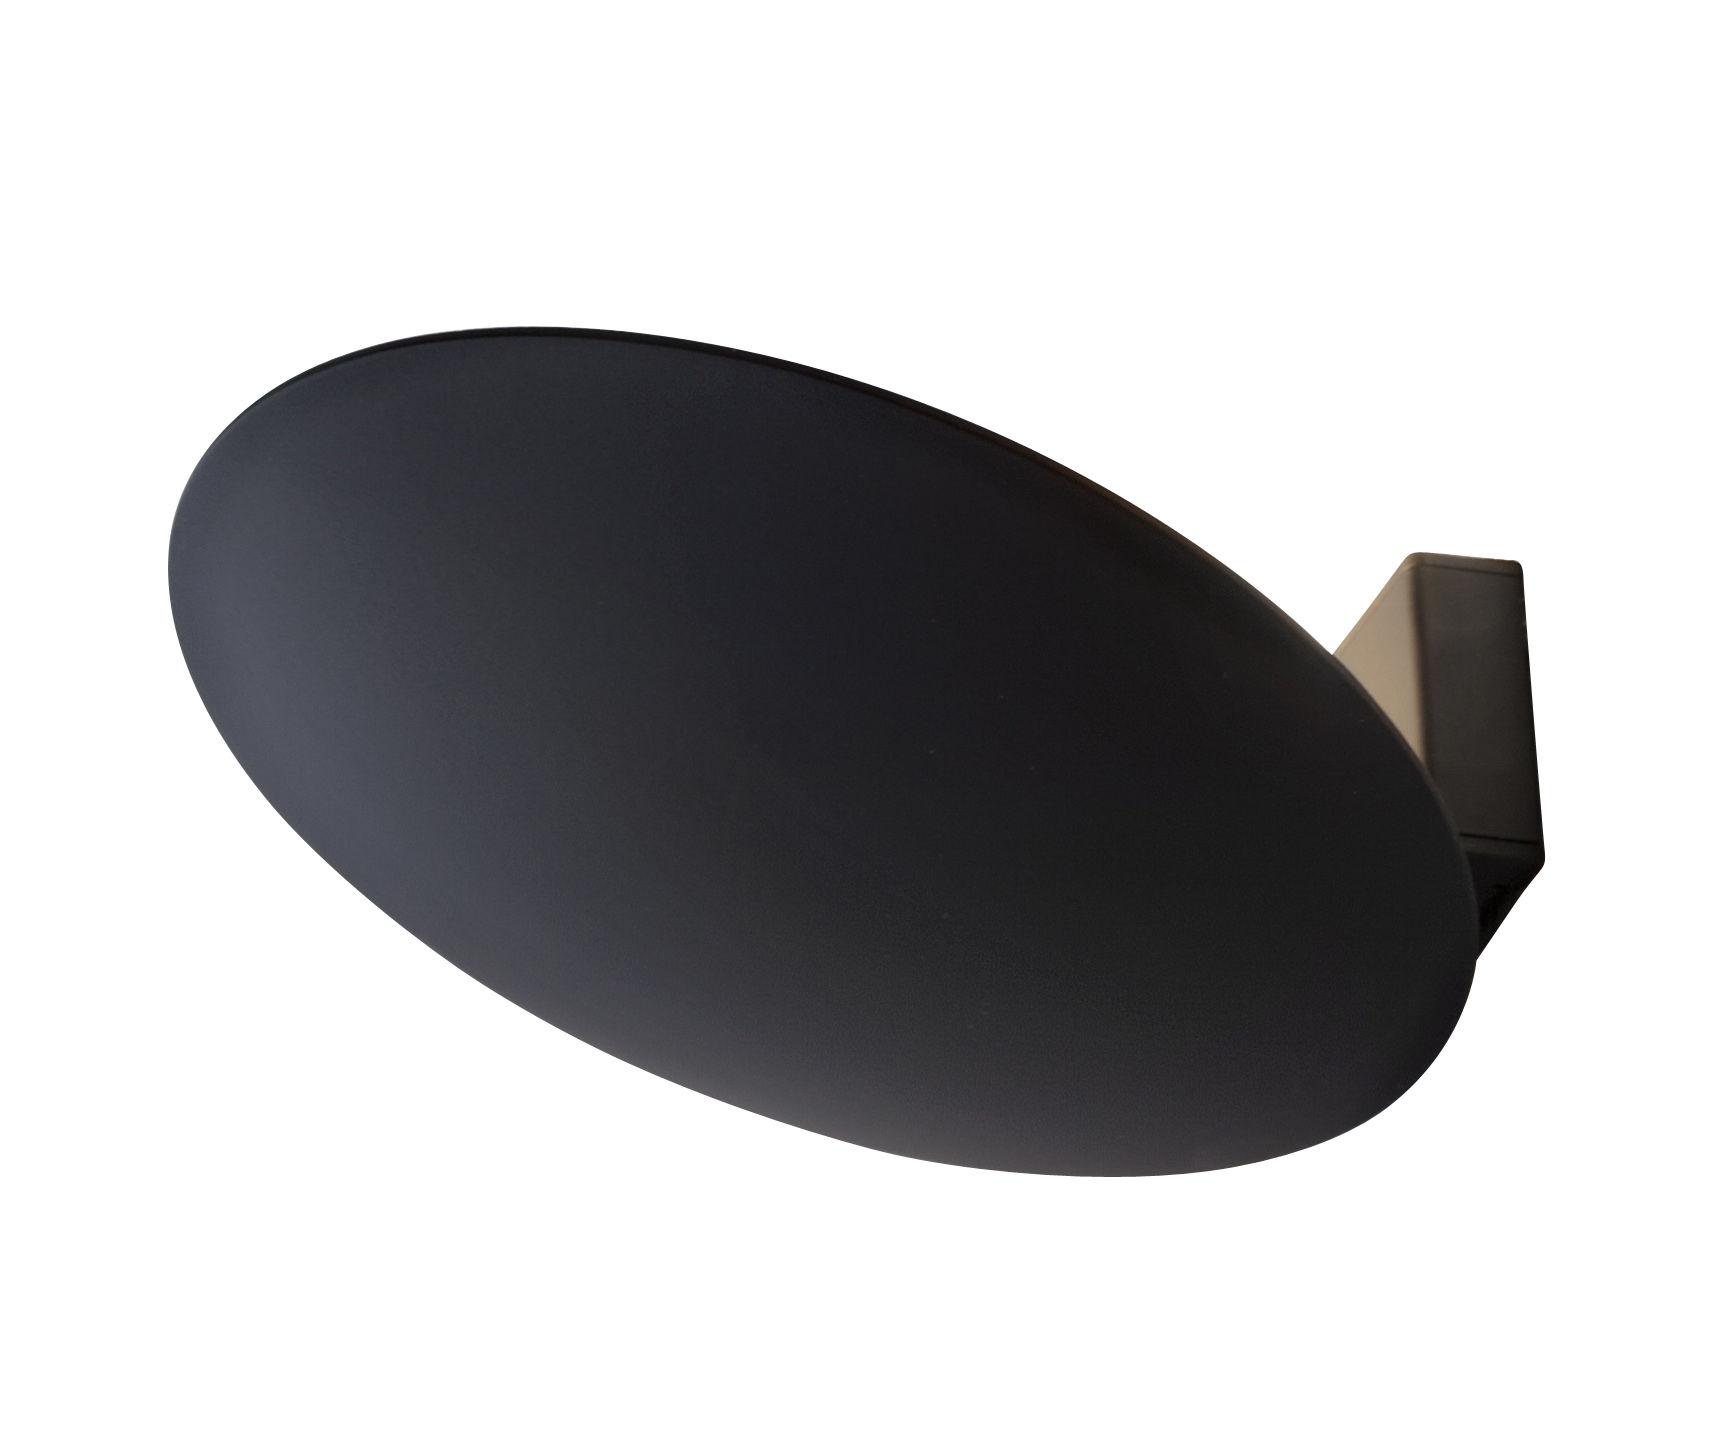 Luminaire - Appliques - Applique Lederam WF / LED - 1 disque fixe Ø 17 cm - Catellani & Smith - Noir - Aluminium peint